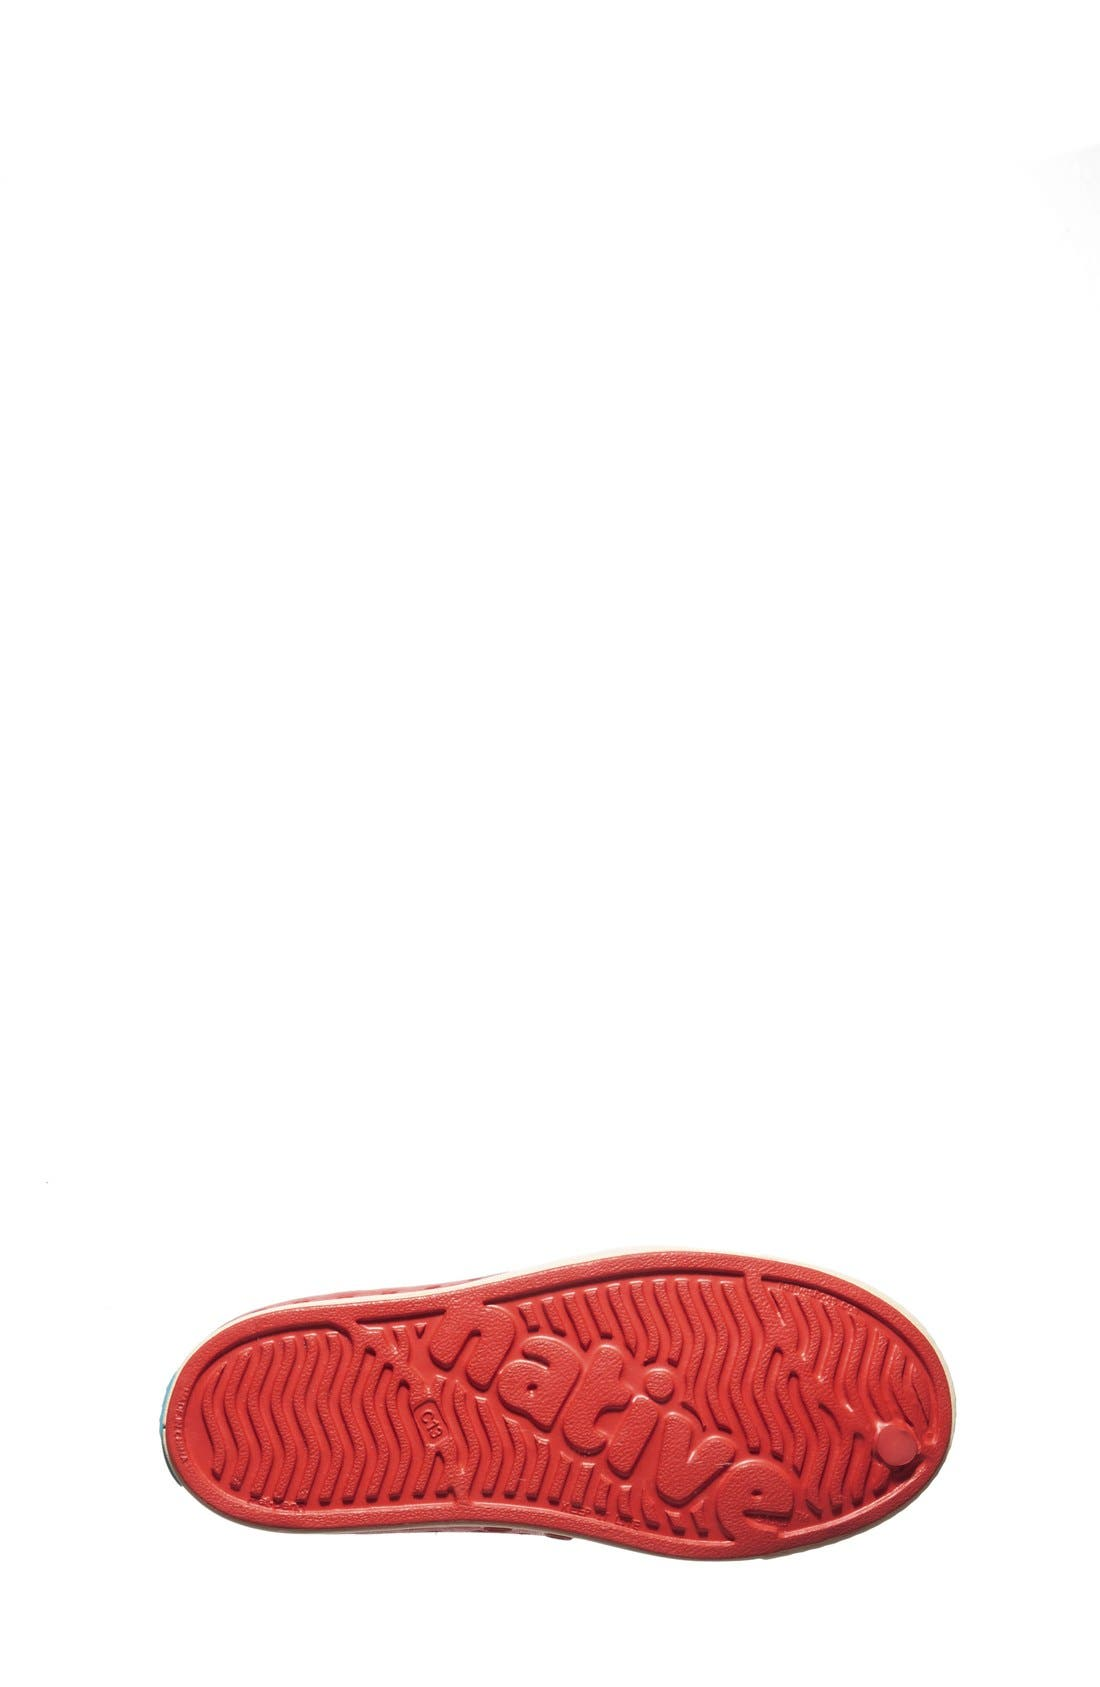 'Jefferson' Water Friendly Slip-On Sneaker,                             Alternate thumbnail 215, color,